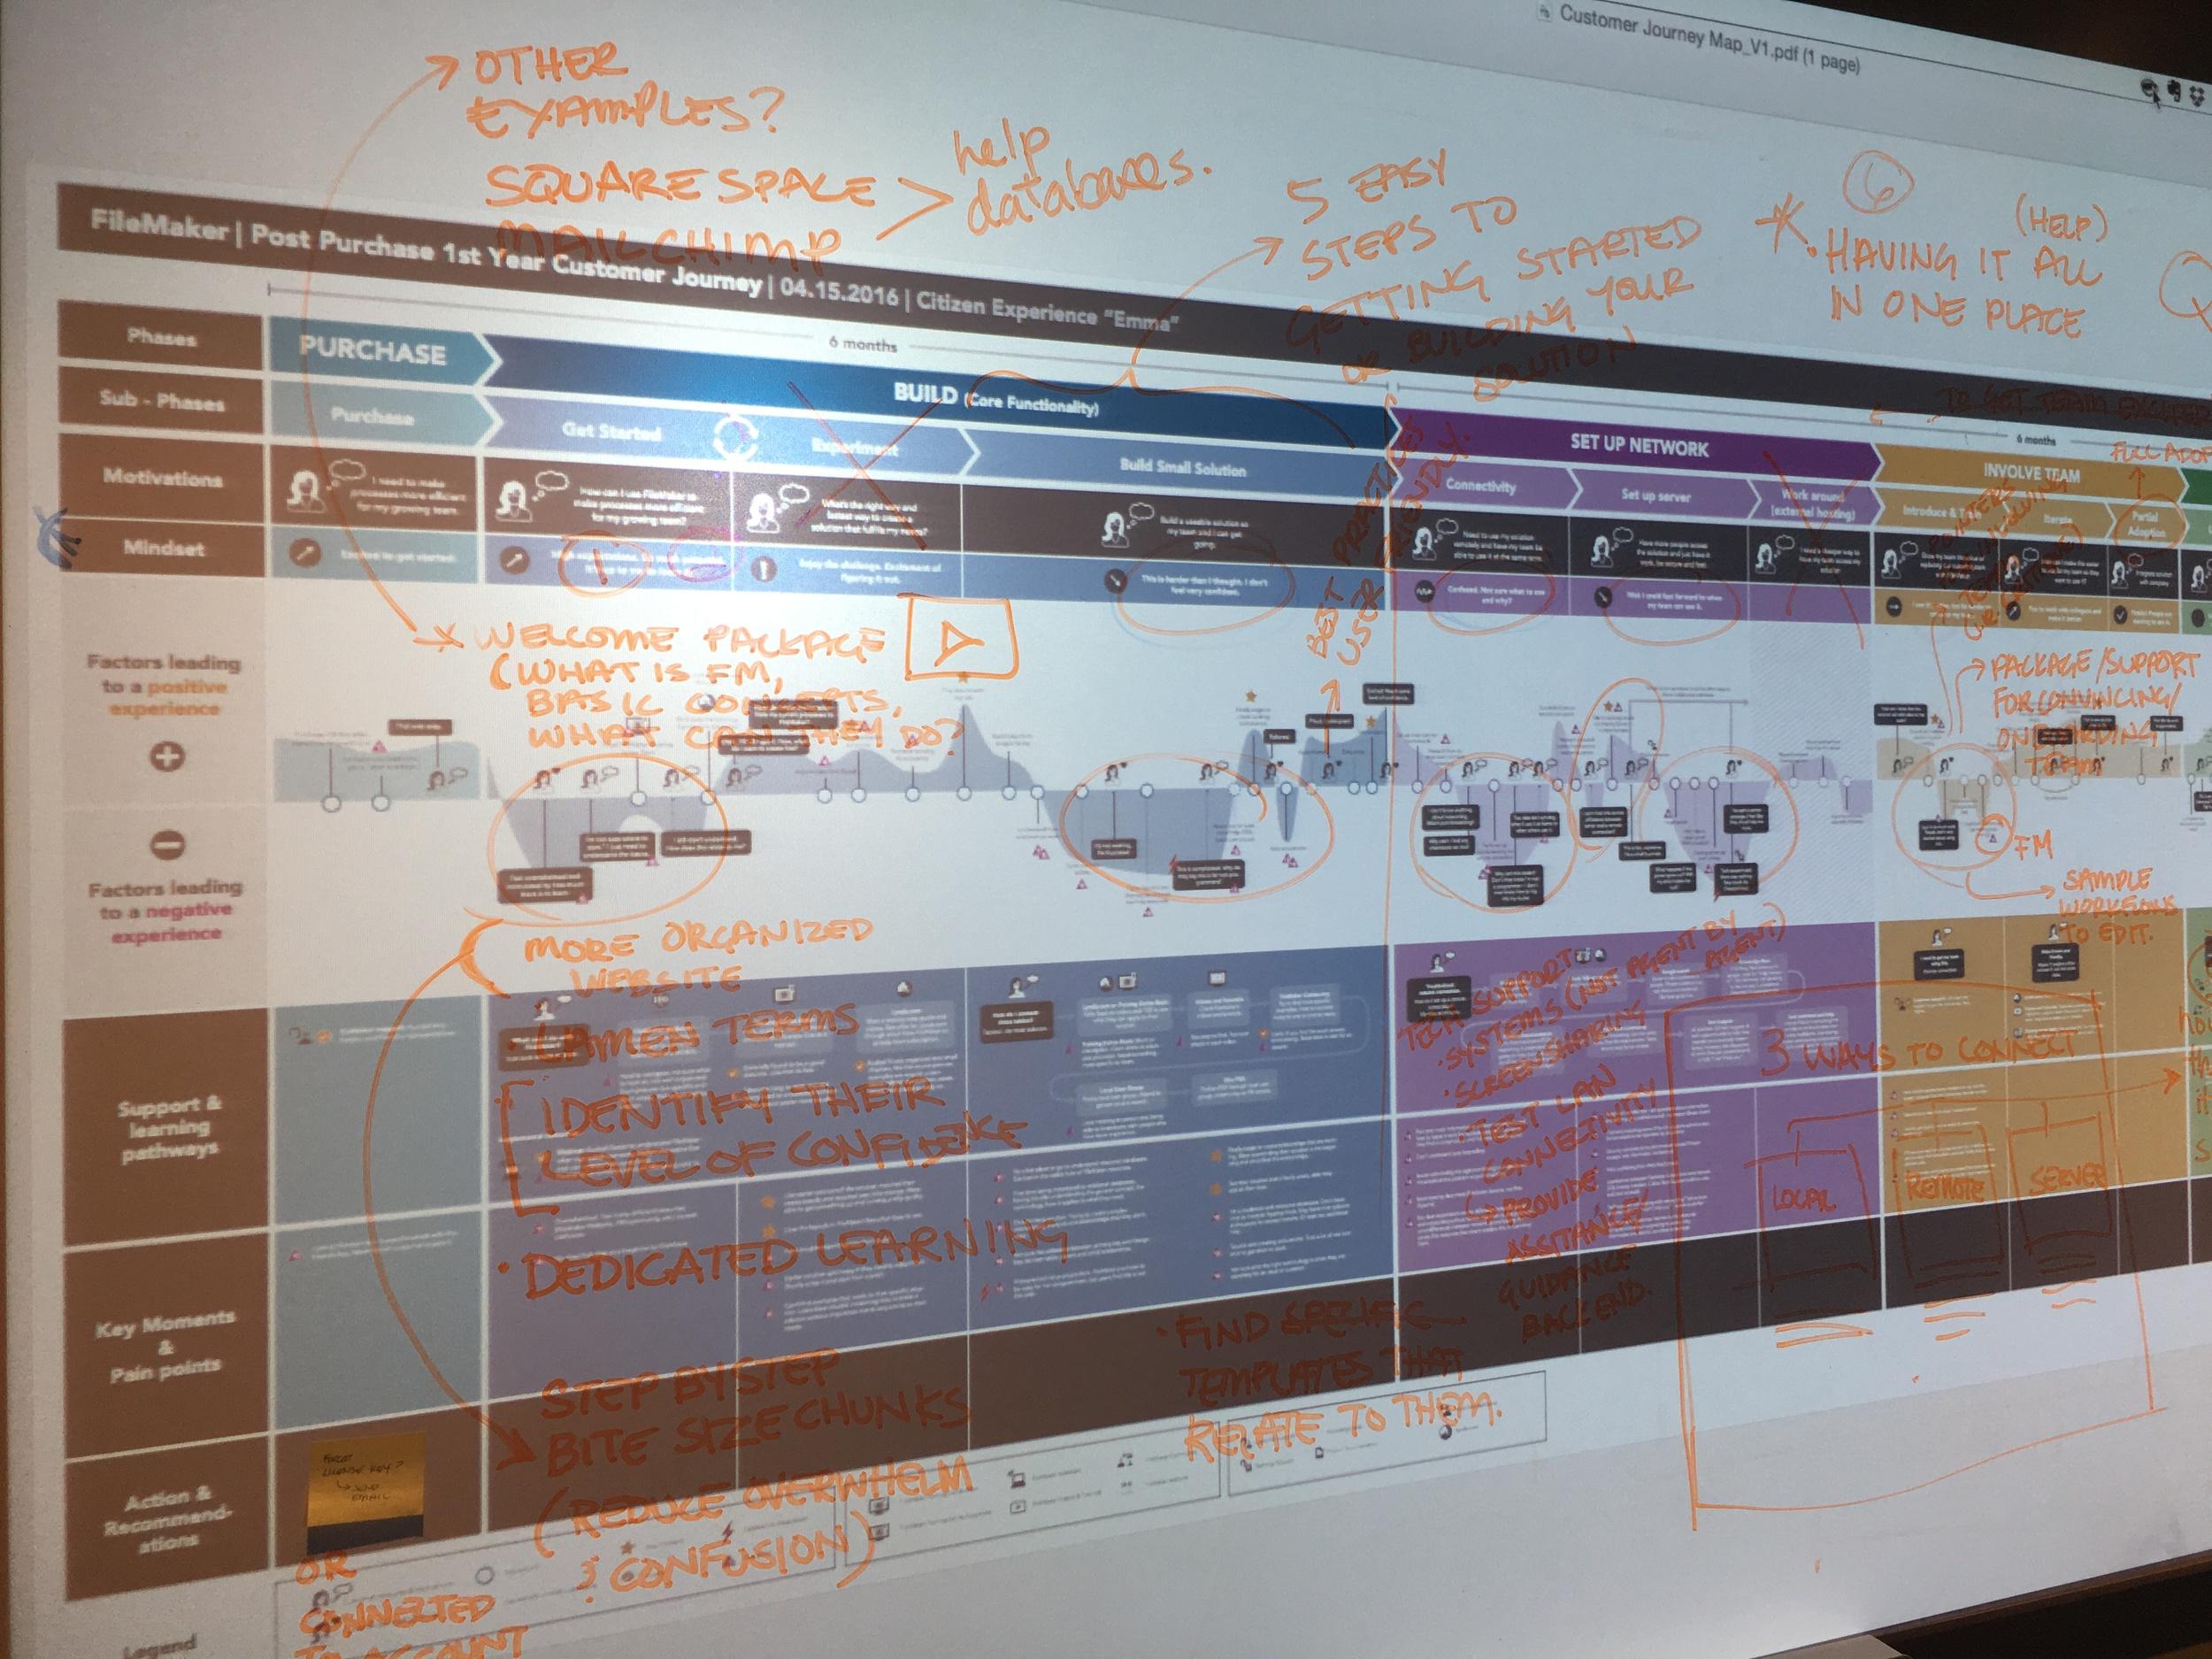 Human centered design workshop with journey maps.